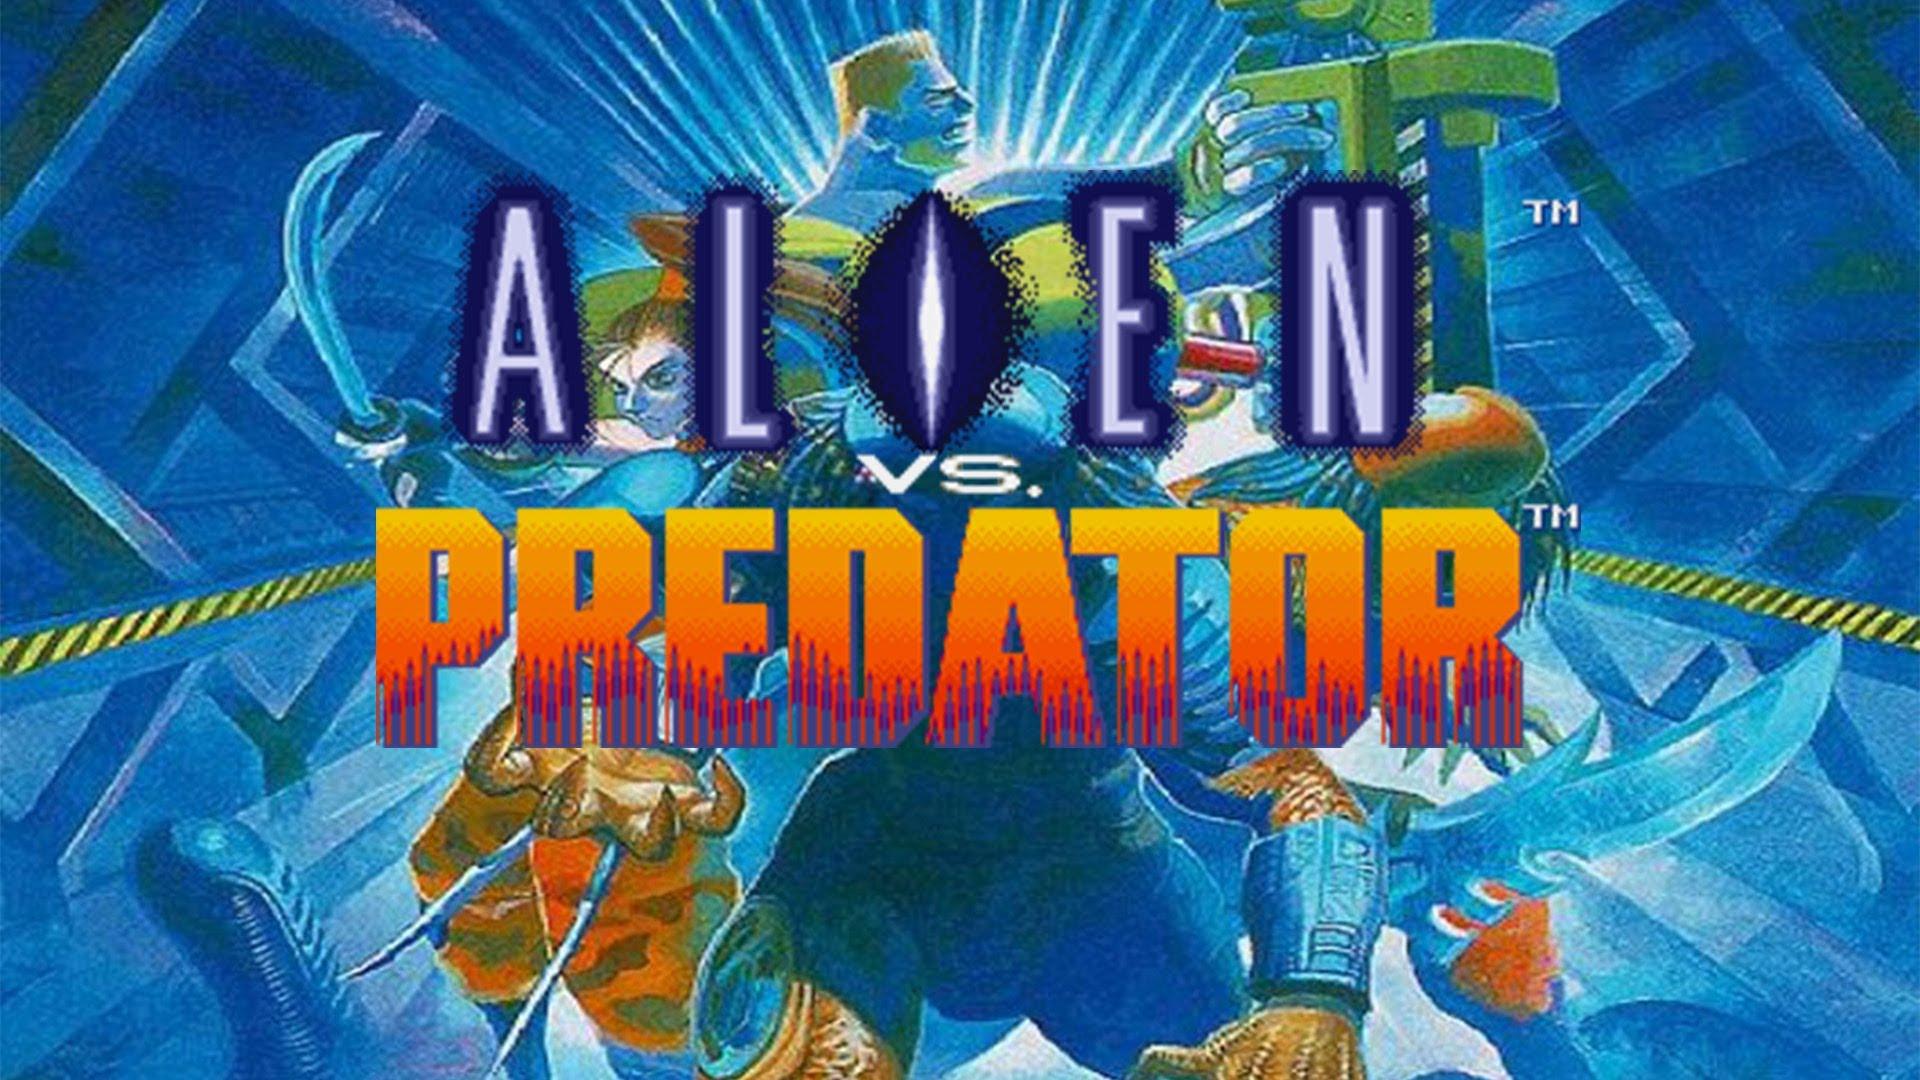 (Update) Capcom teases announcement featuring Darkstalkers, Alien Vs. Predator and more screenshot